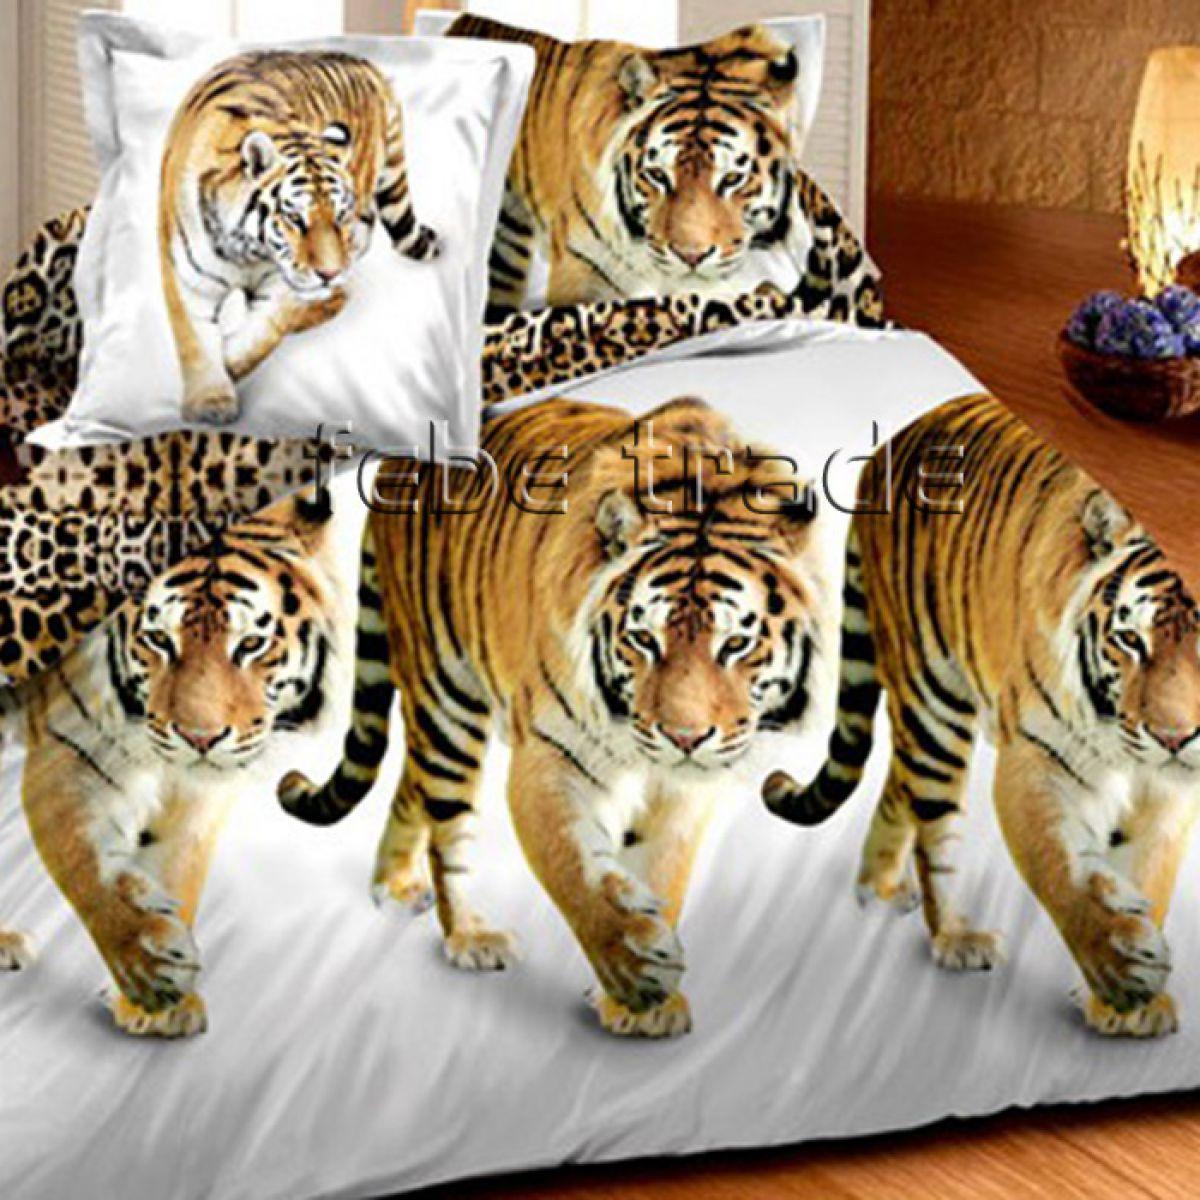 3D Beddings - Cotton World - FSB-2003 - 220x200 cm - 4 pcs